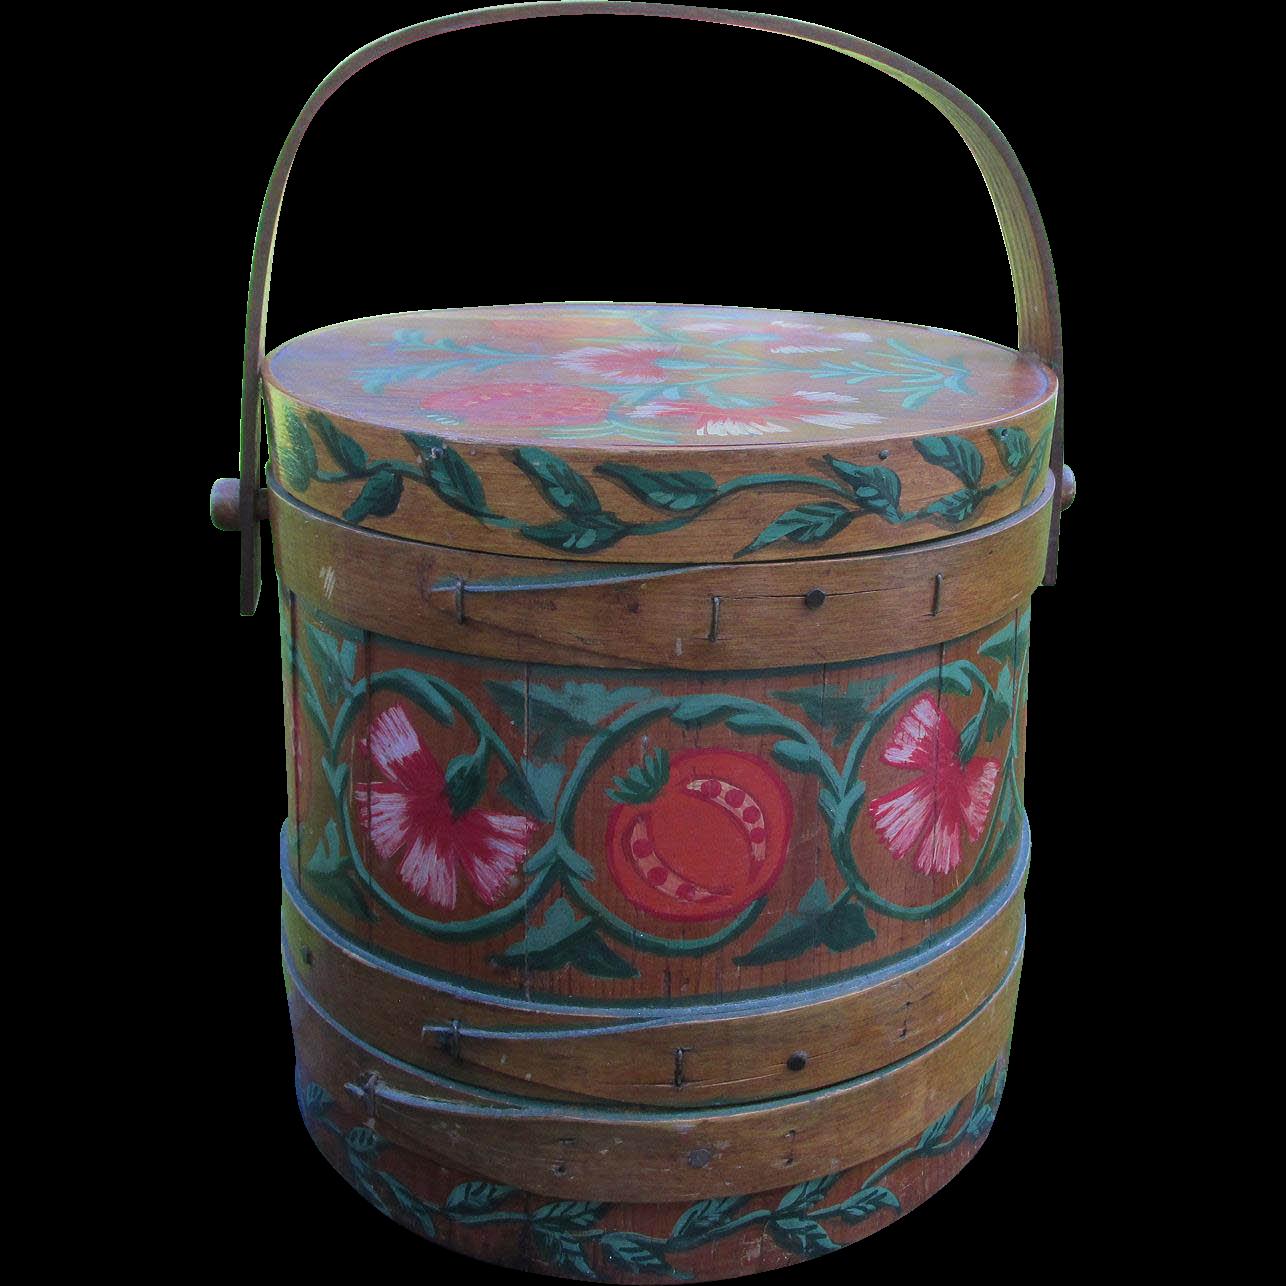 Vintage Folk Art Hand Painted Firkin, Wood Sugar Bucket